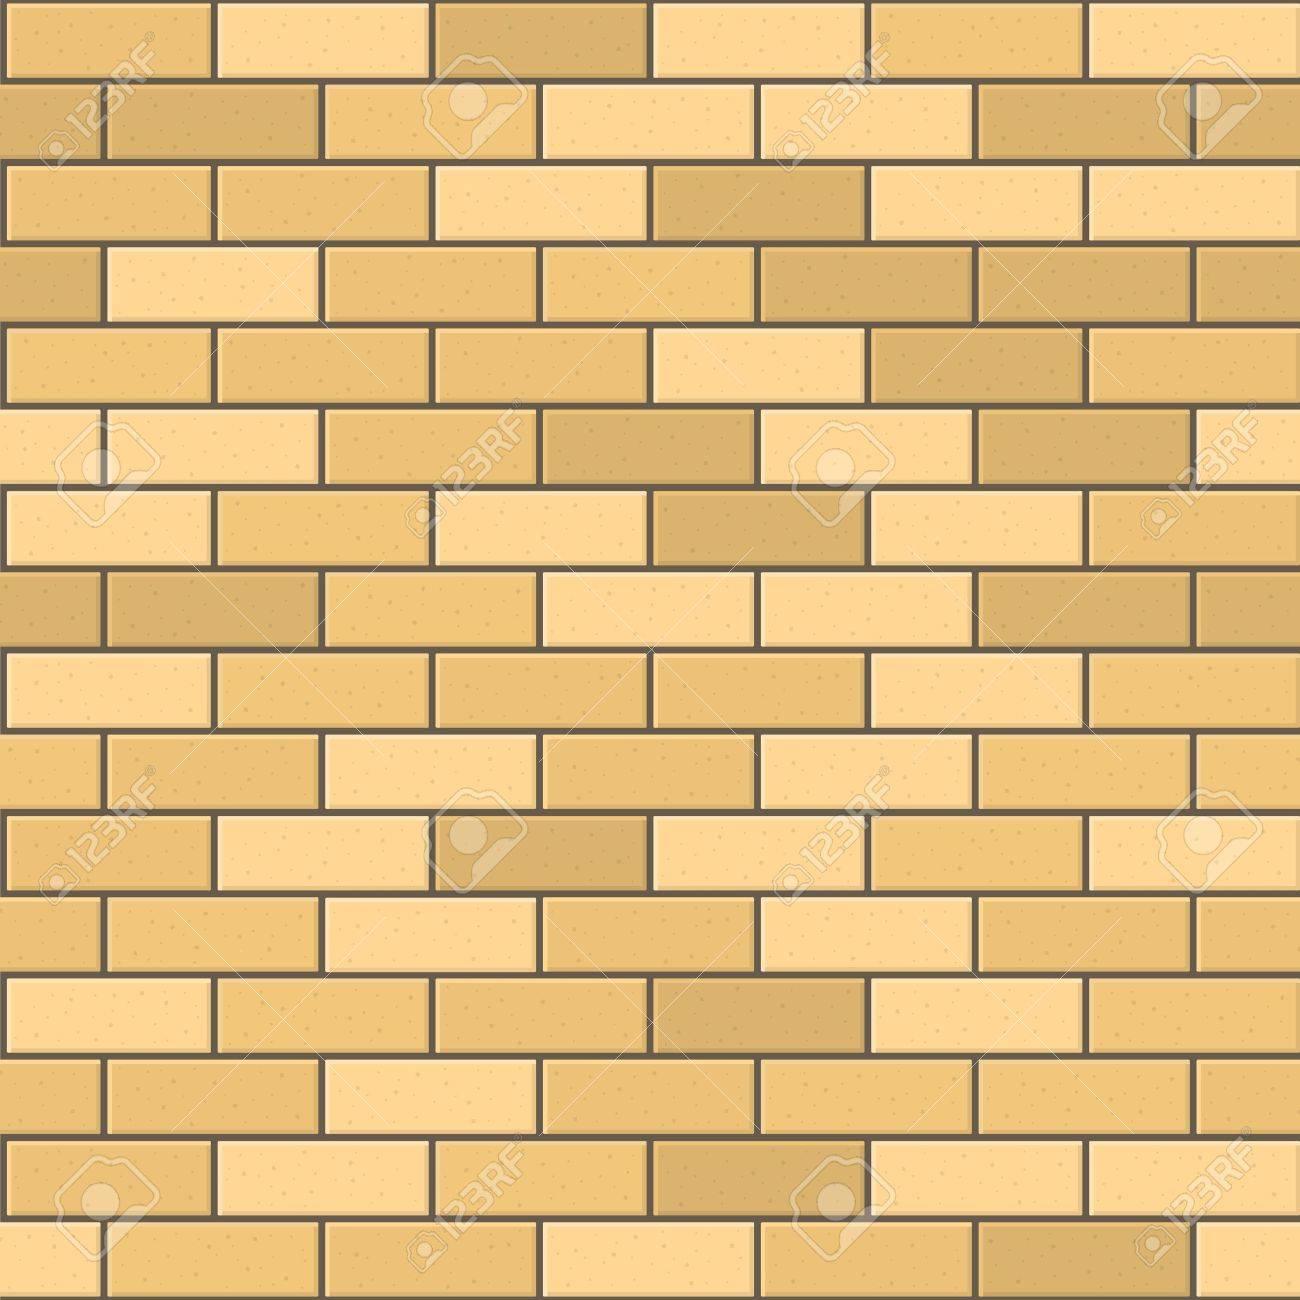 Seamless Pattern Of Yellow Brick With Dark Seam. Vector Illustration ...